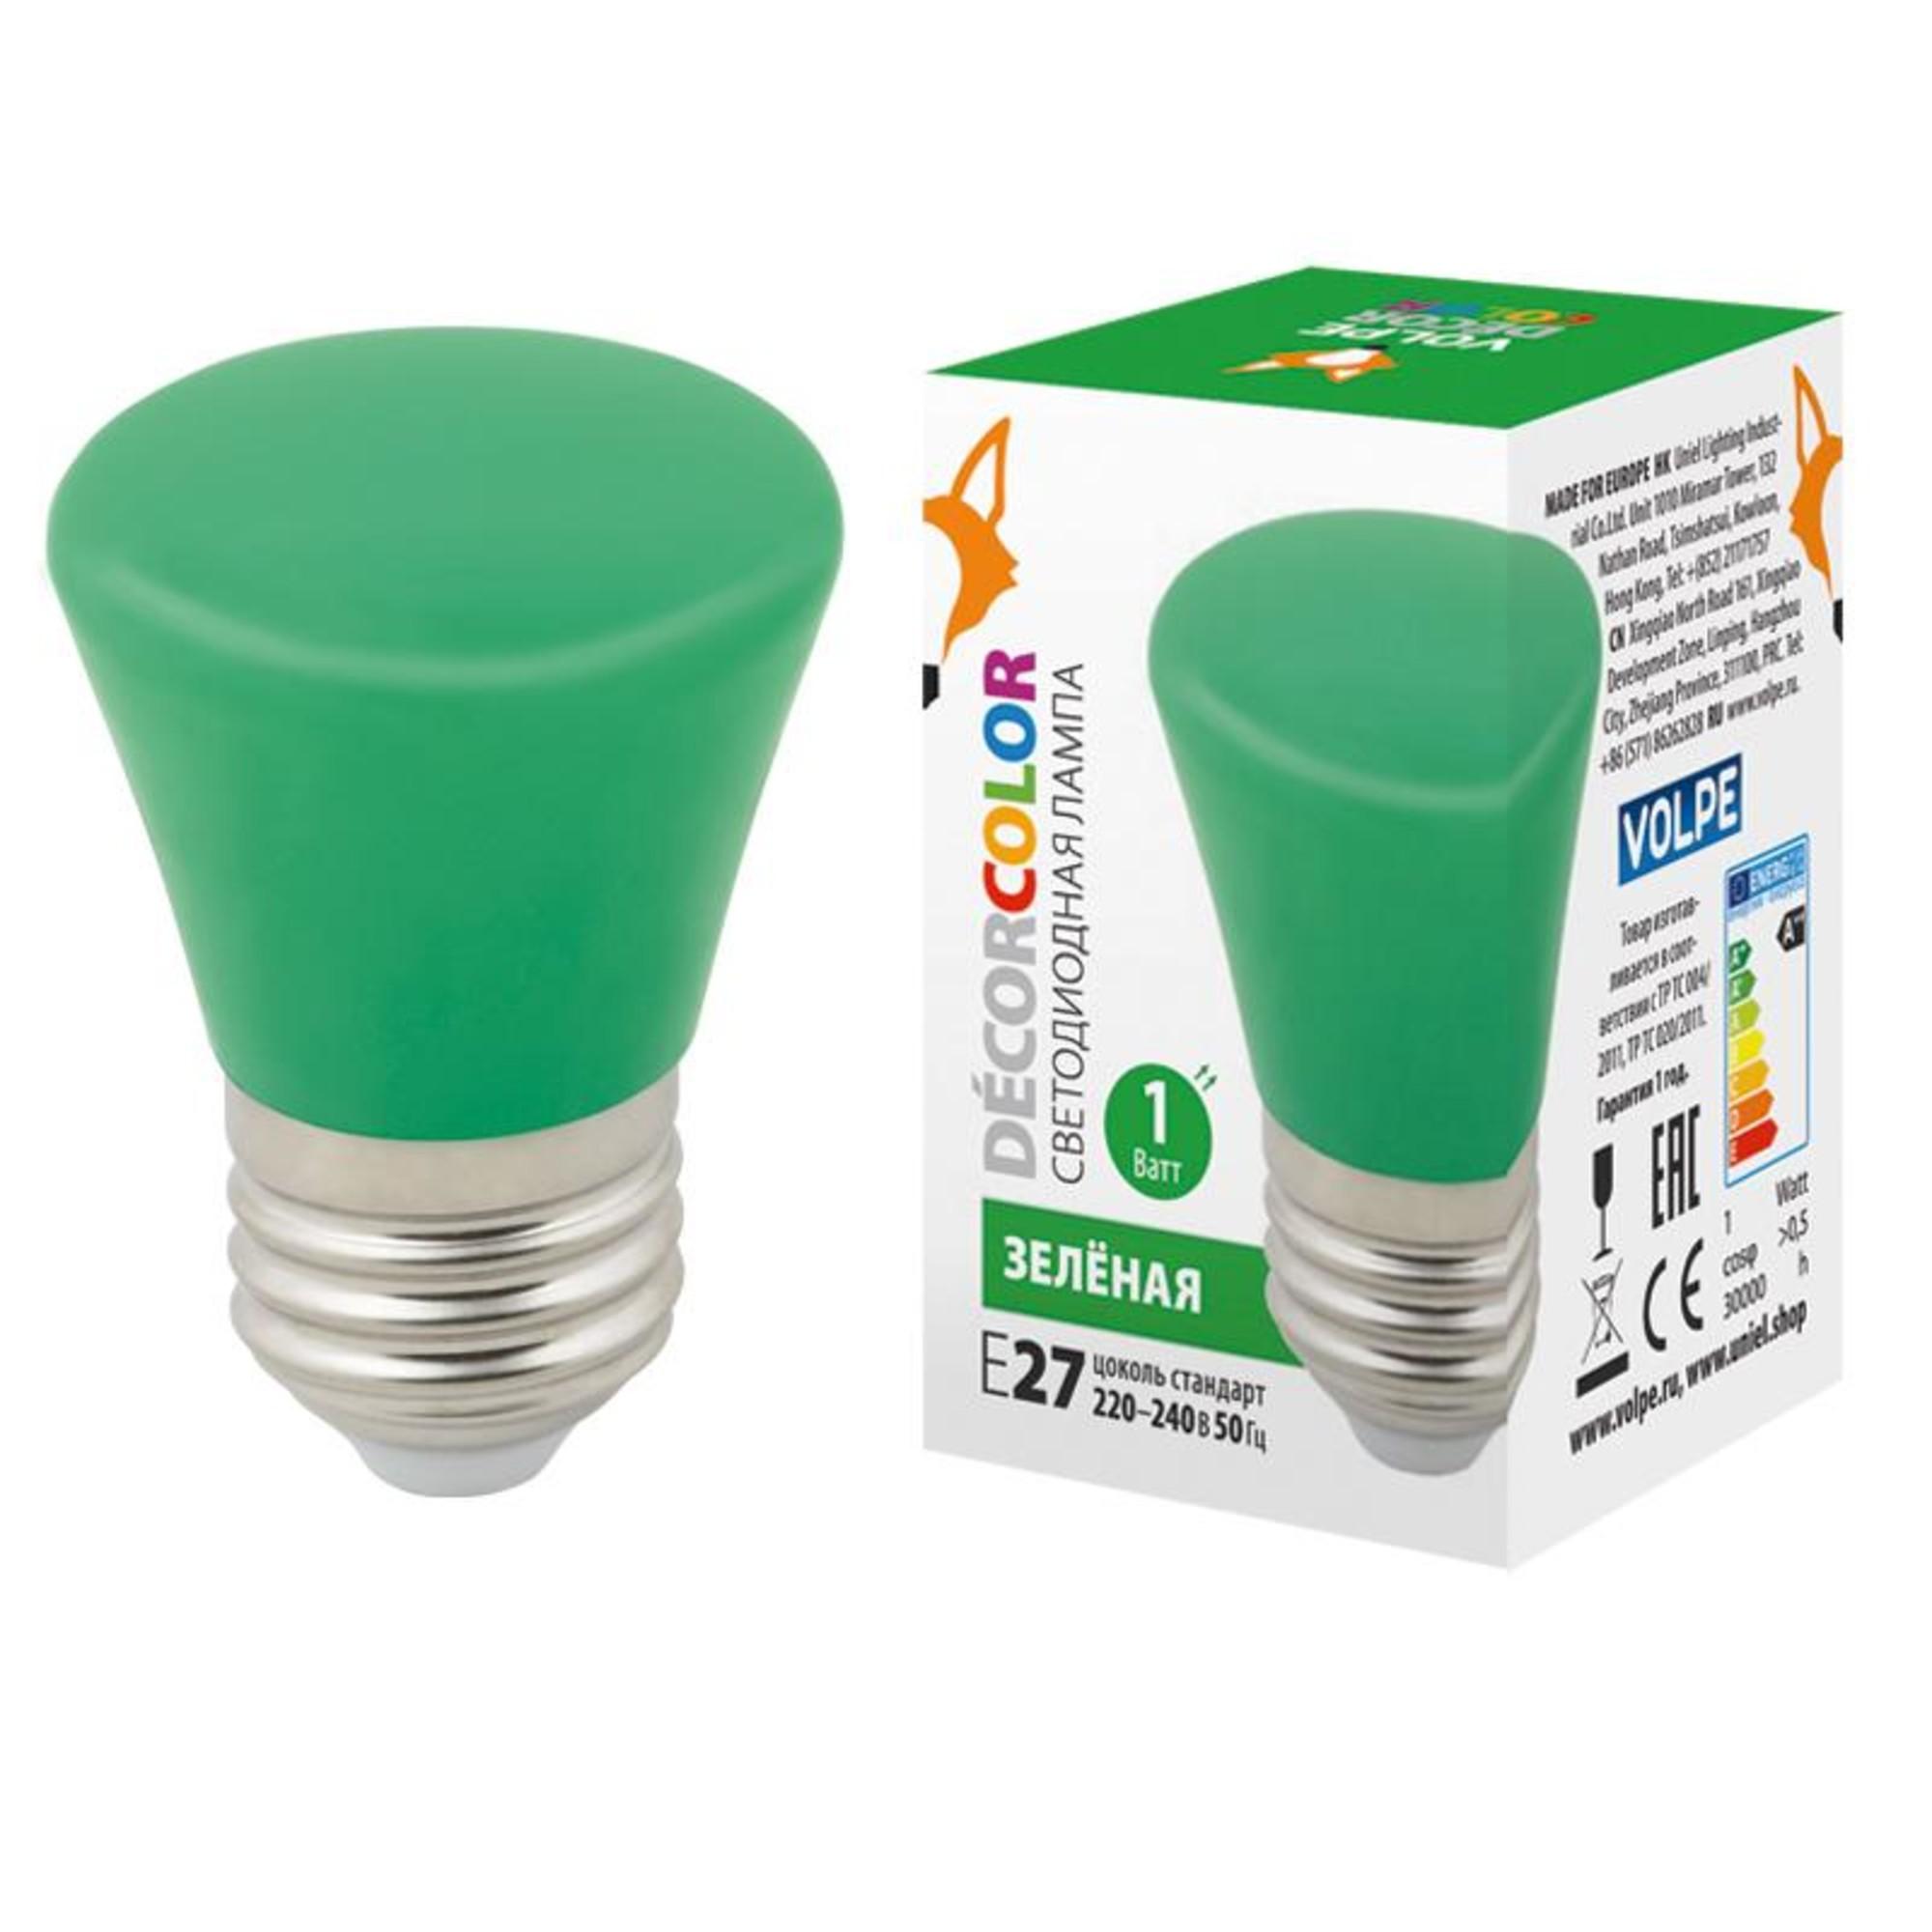 Светодиодная лампочка Volpe LED-D45-1W DÉCOR COLOR UL-00005640